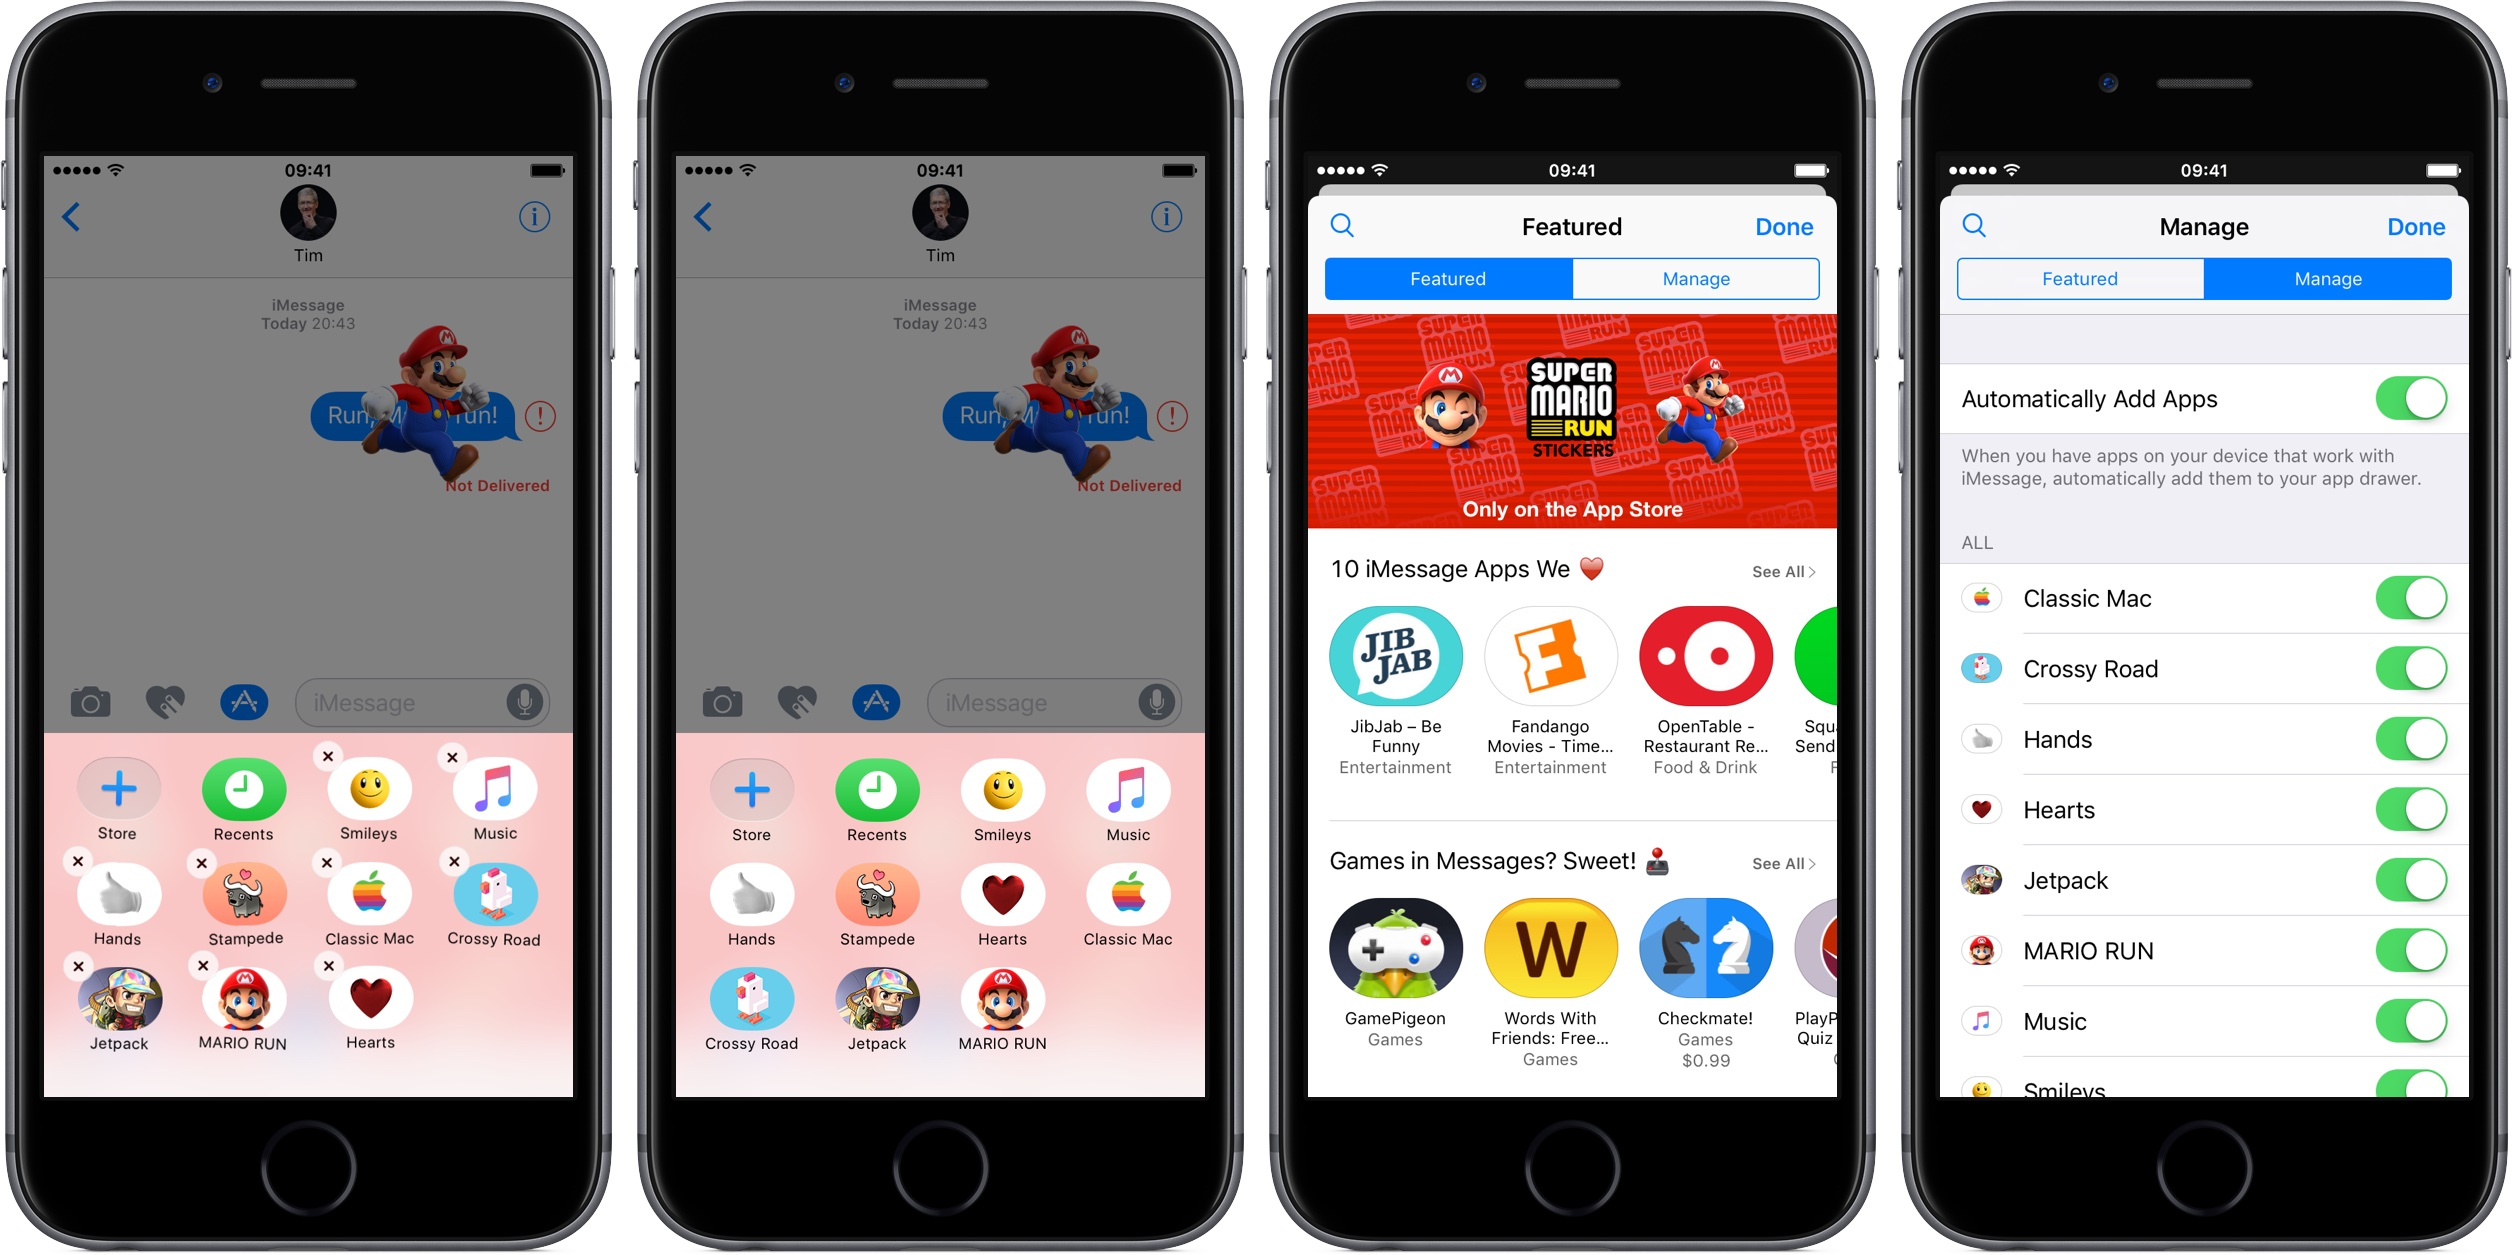 ios-10-messages-app-store-iphone-screenshot-001